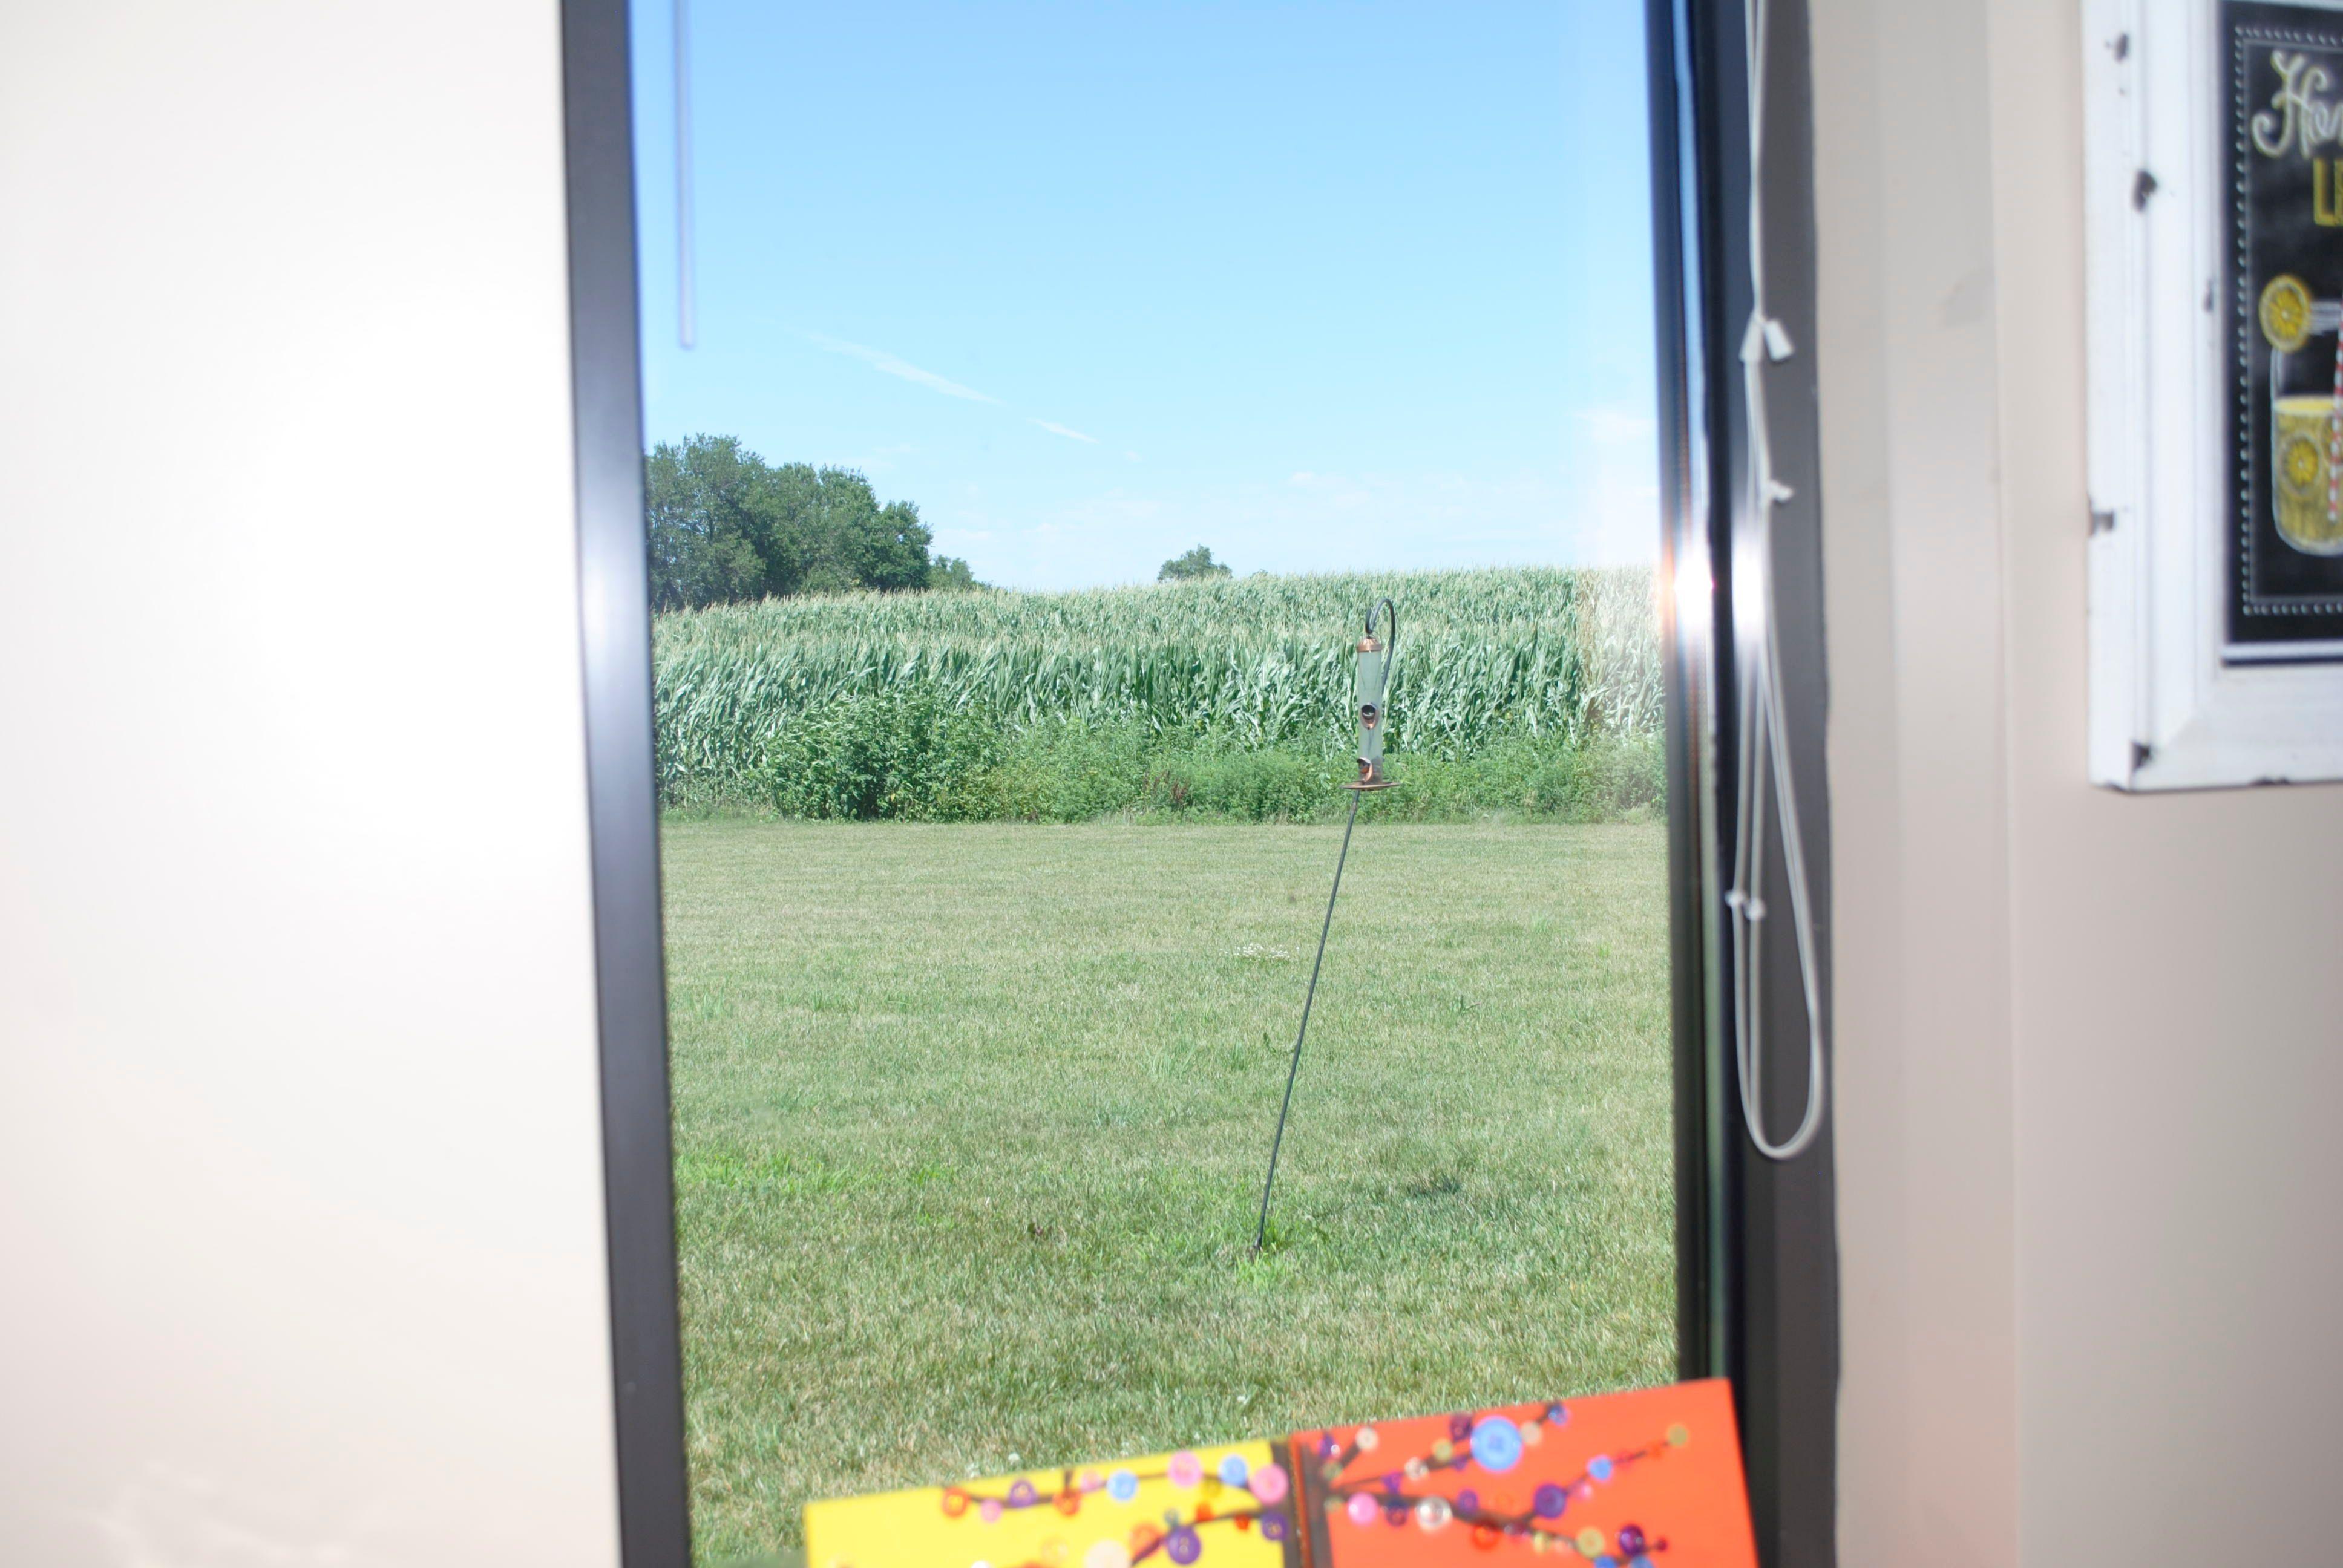 My Window View | Crops